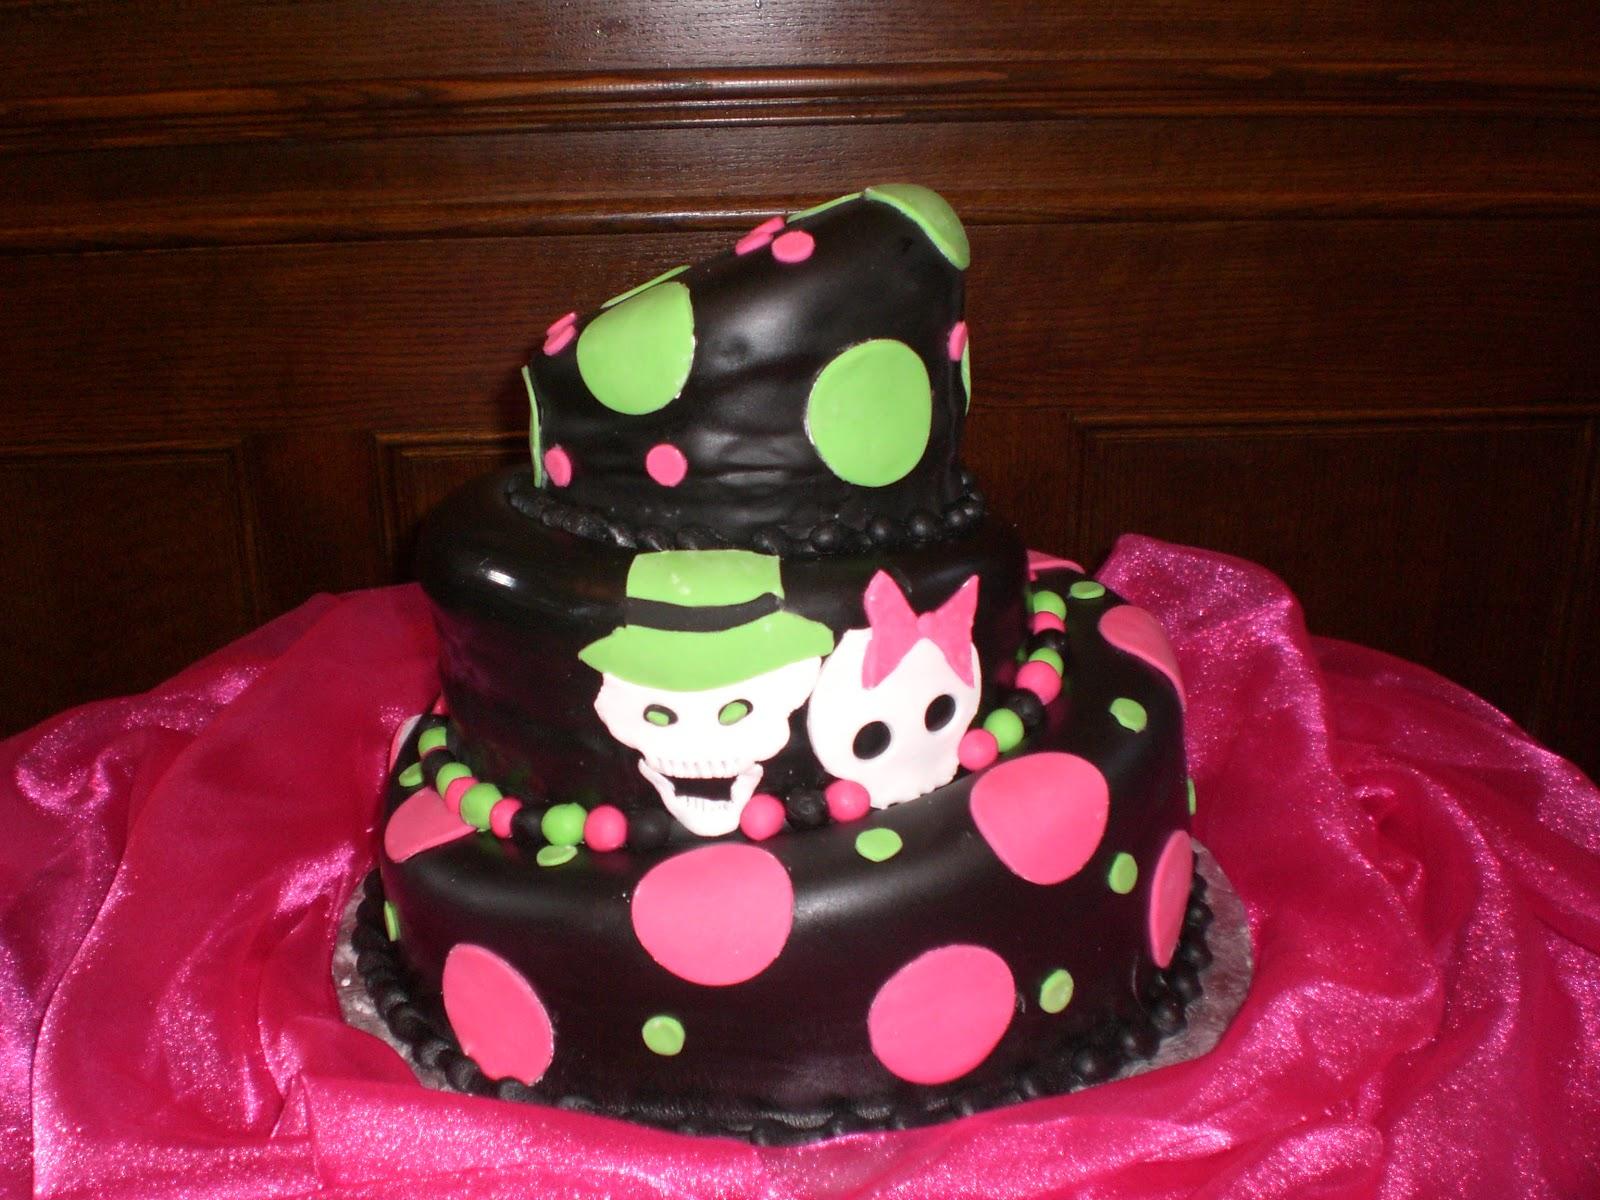 Cake Art Lawrenceville Hwy : CAFE AROMAS: Skull Wedding Cakes